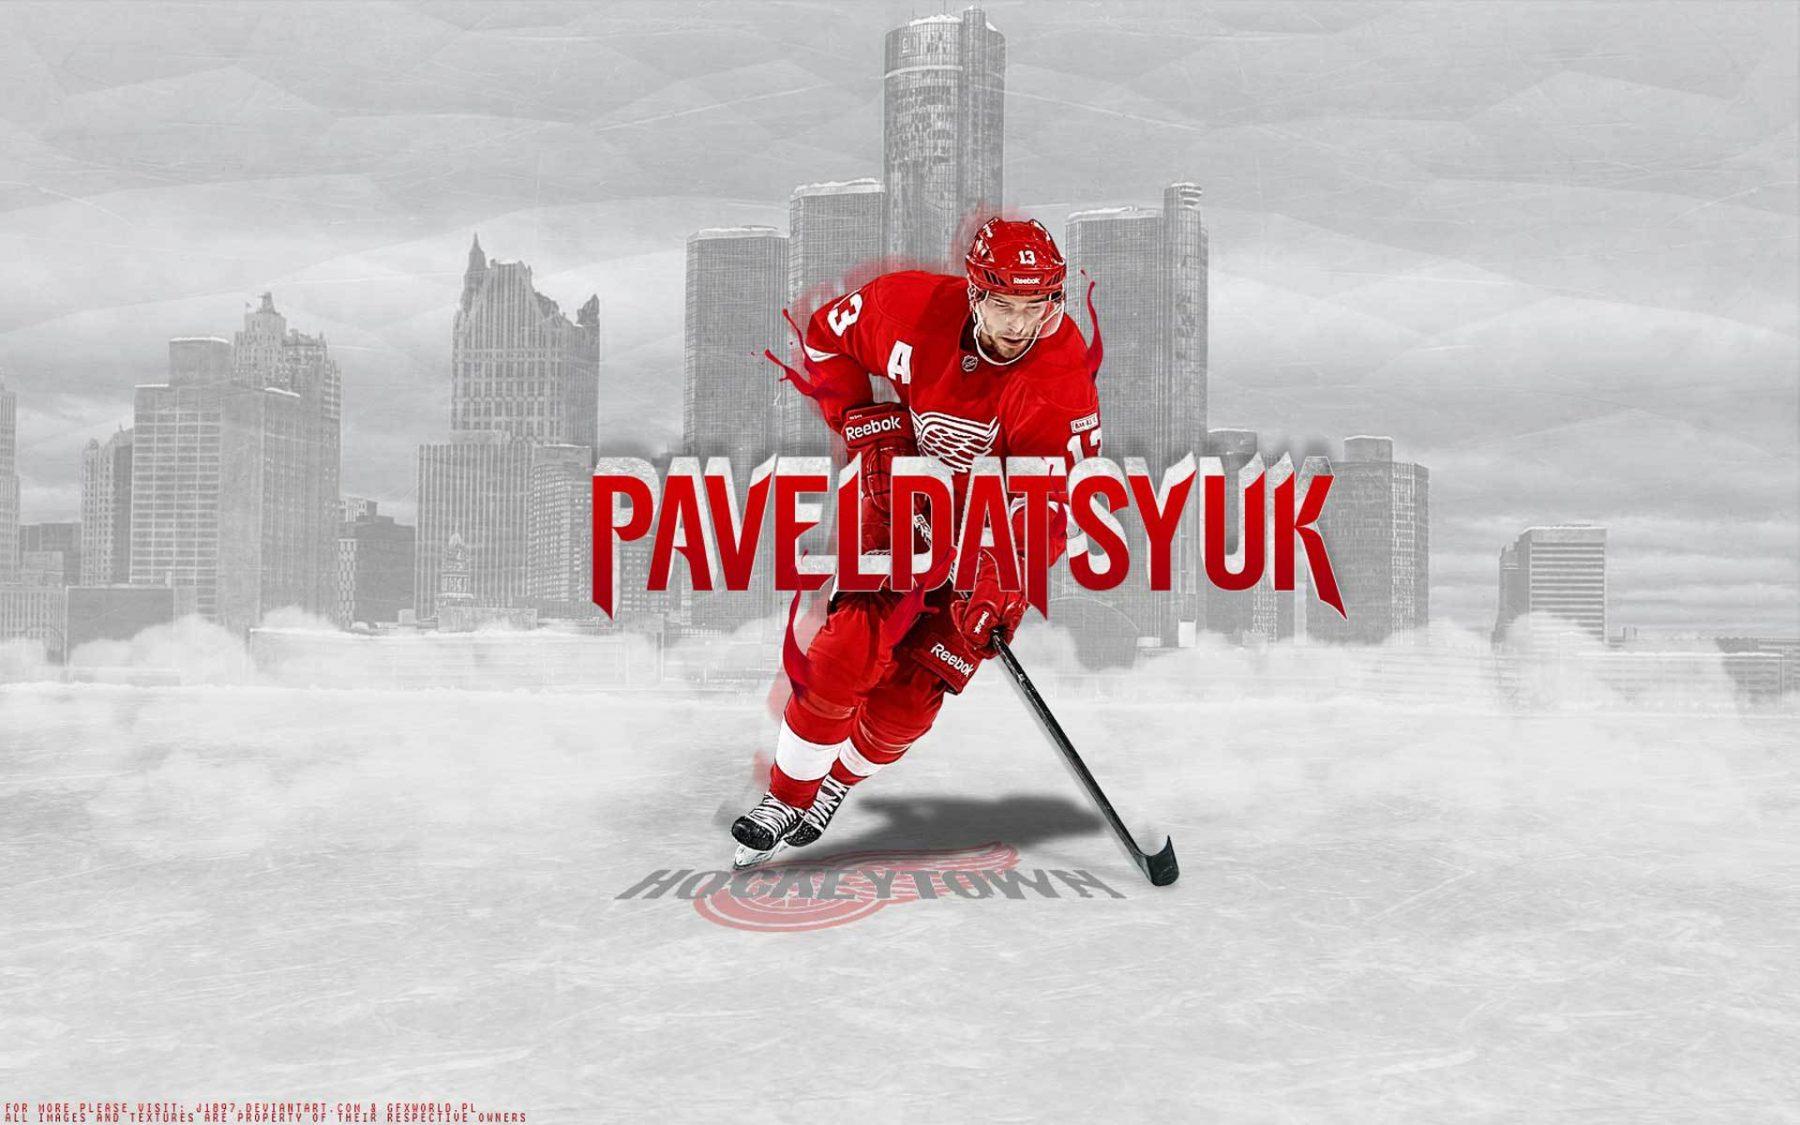 Pavel Datsyuk HD Wallpapers 7wallpapersnet 1800x1125